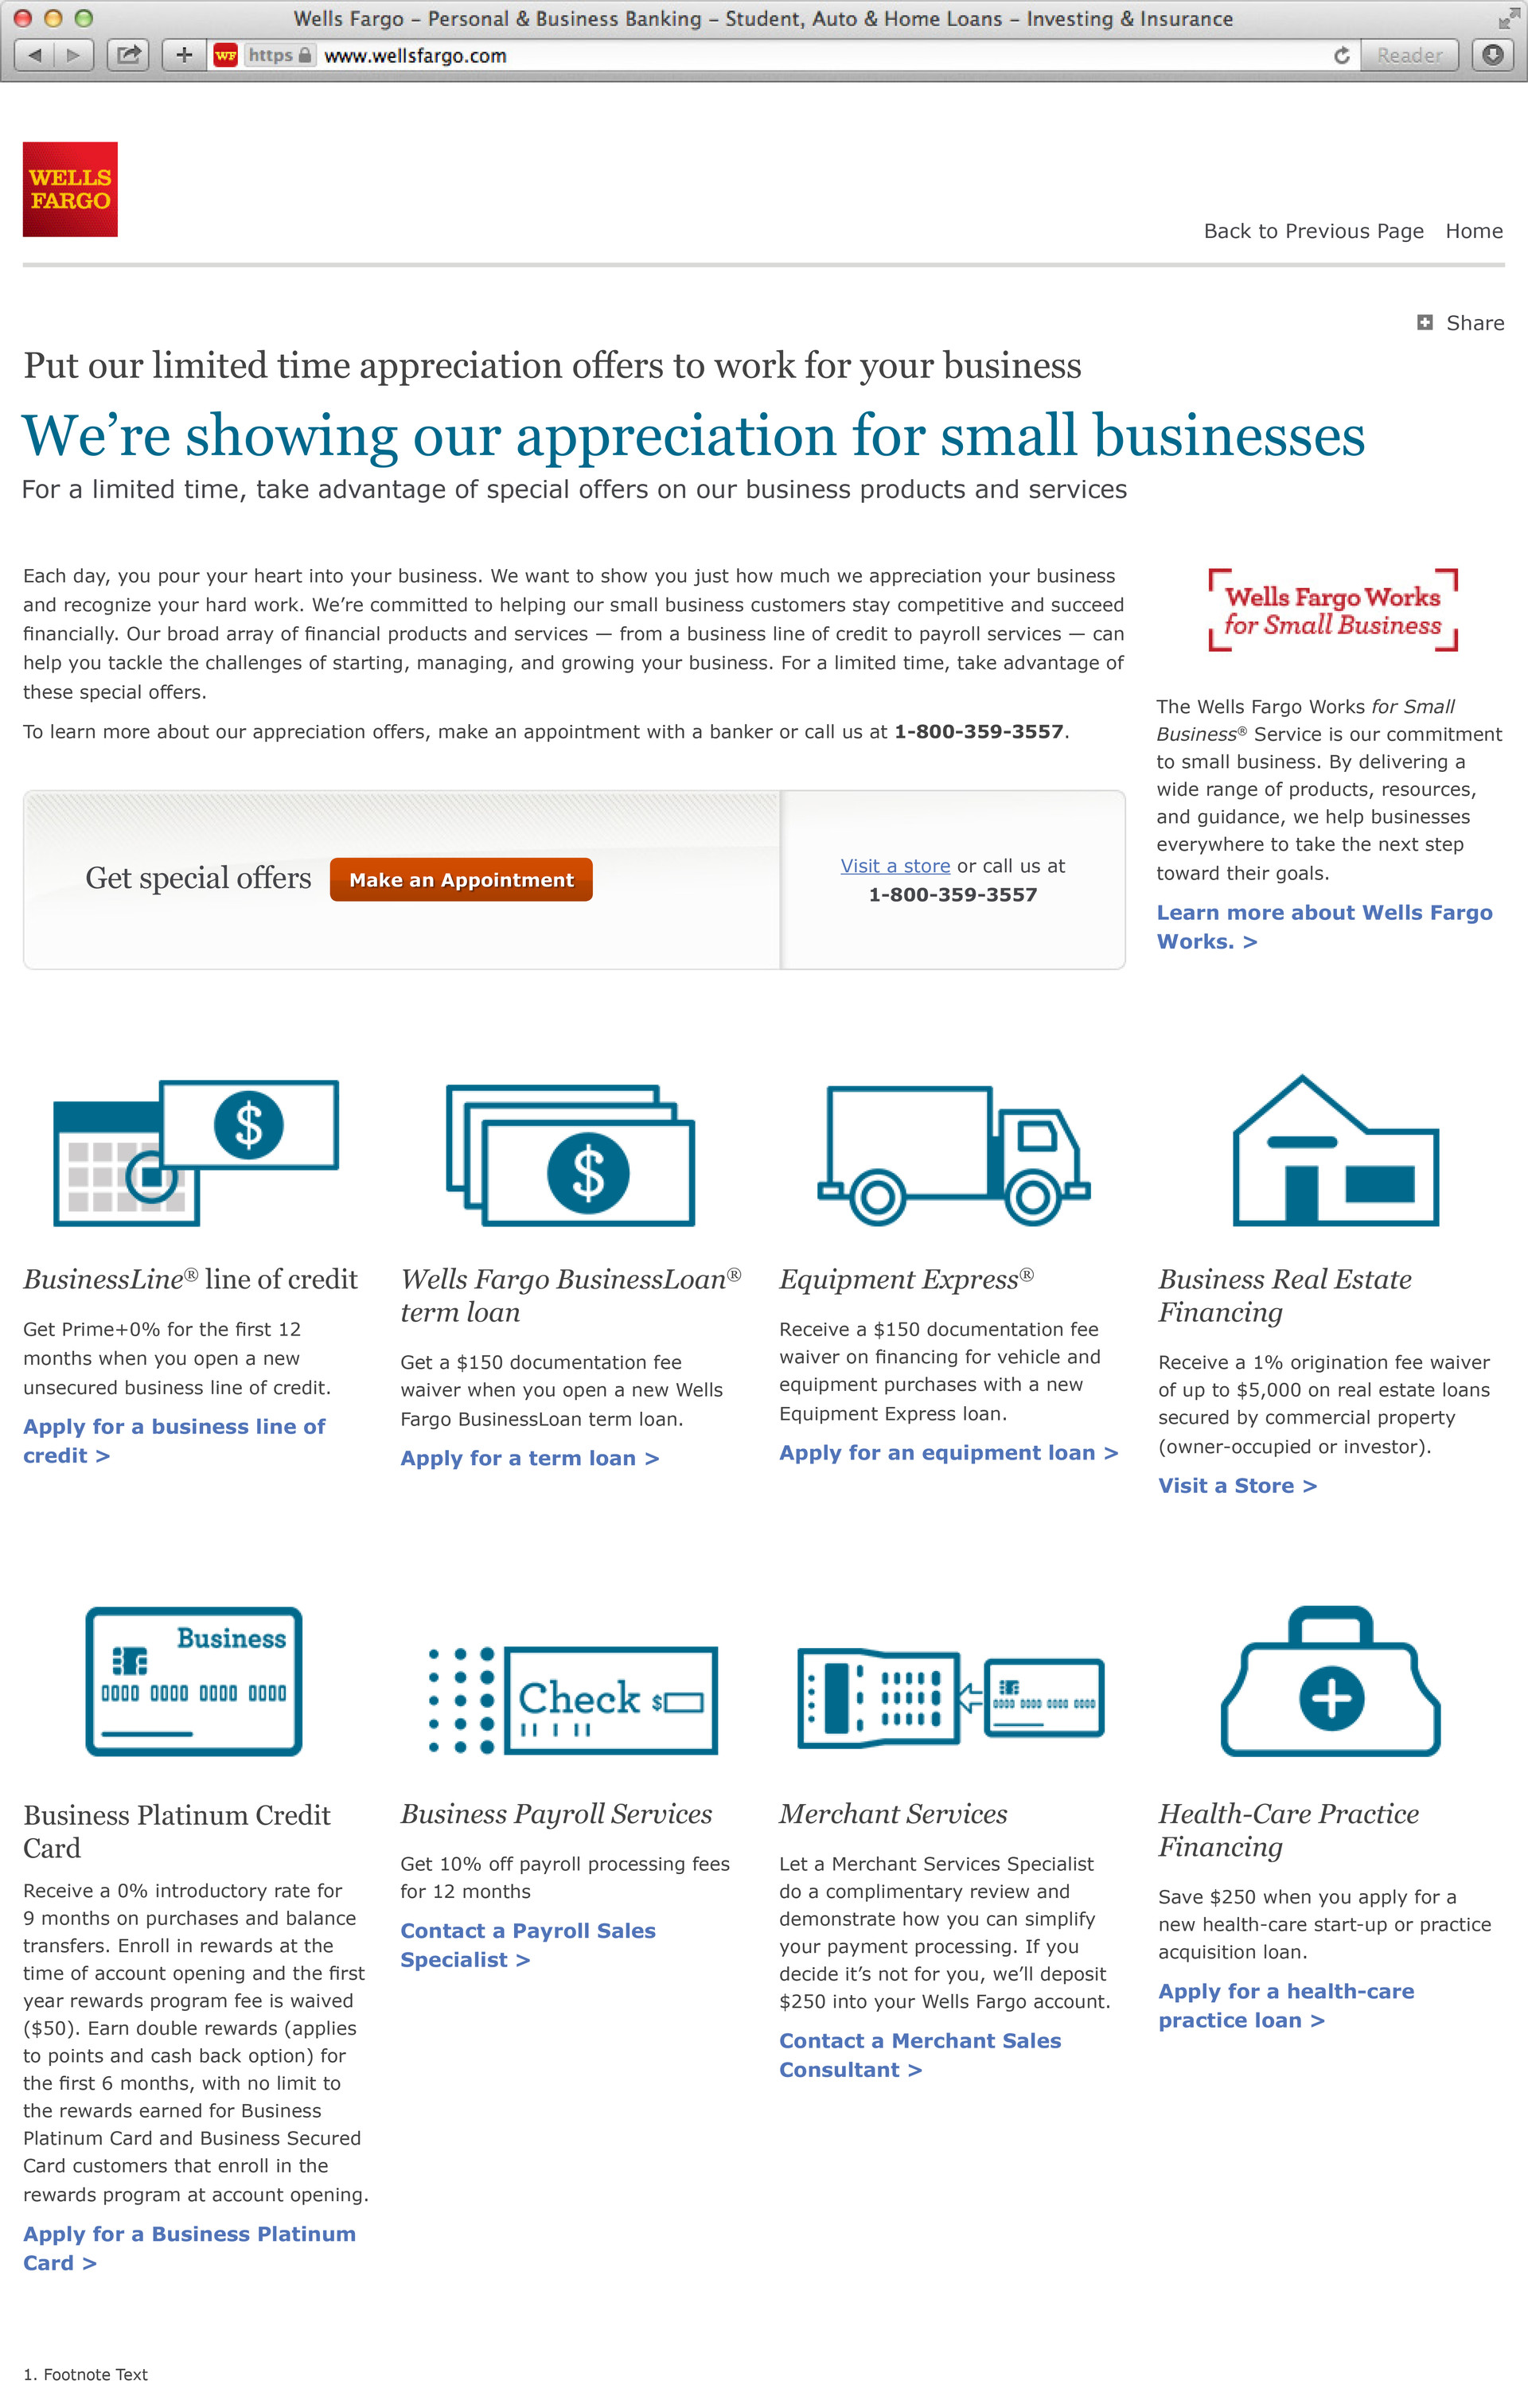 Wells Fargo Business Landing Page